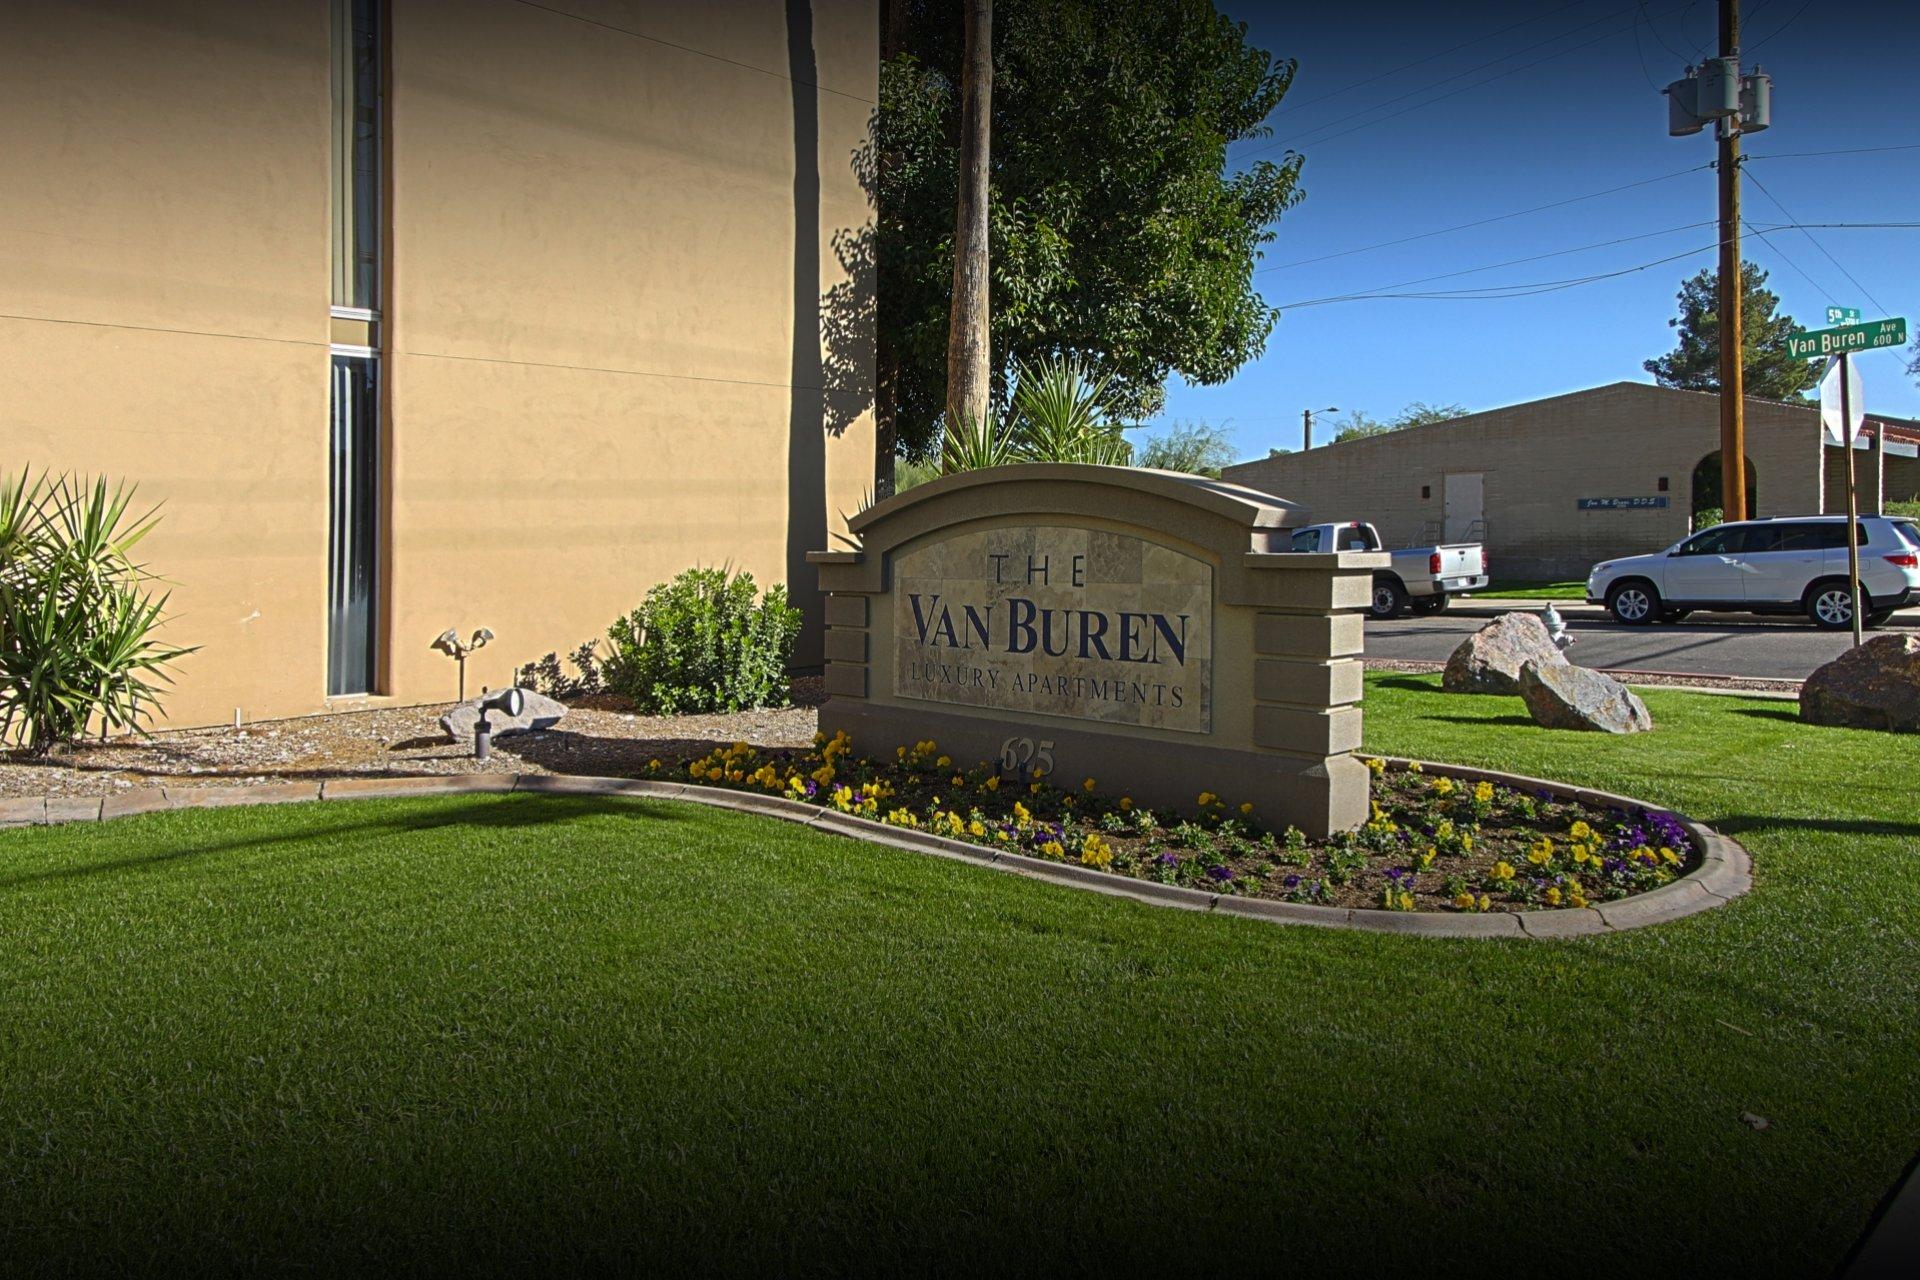 Van Buren Apartments Tucson, AZ signage